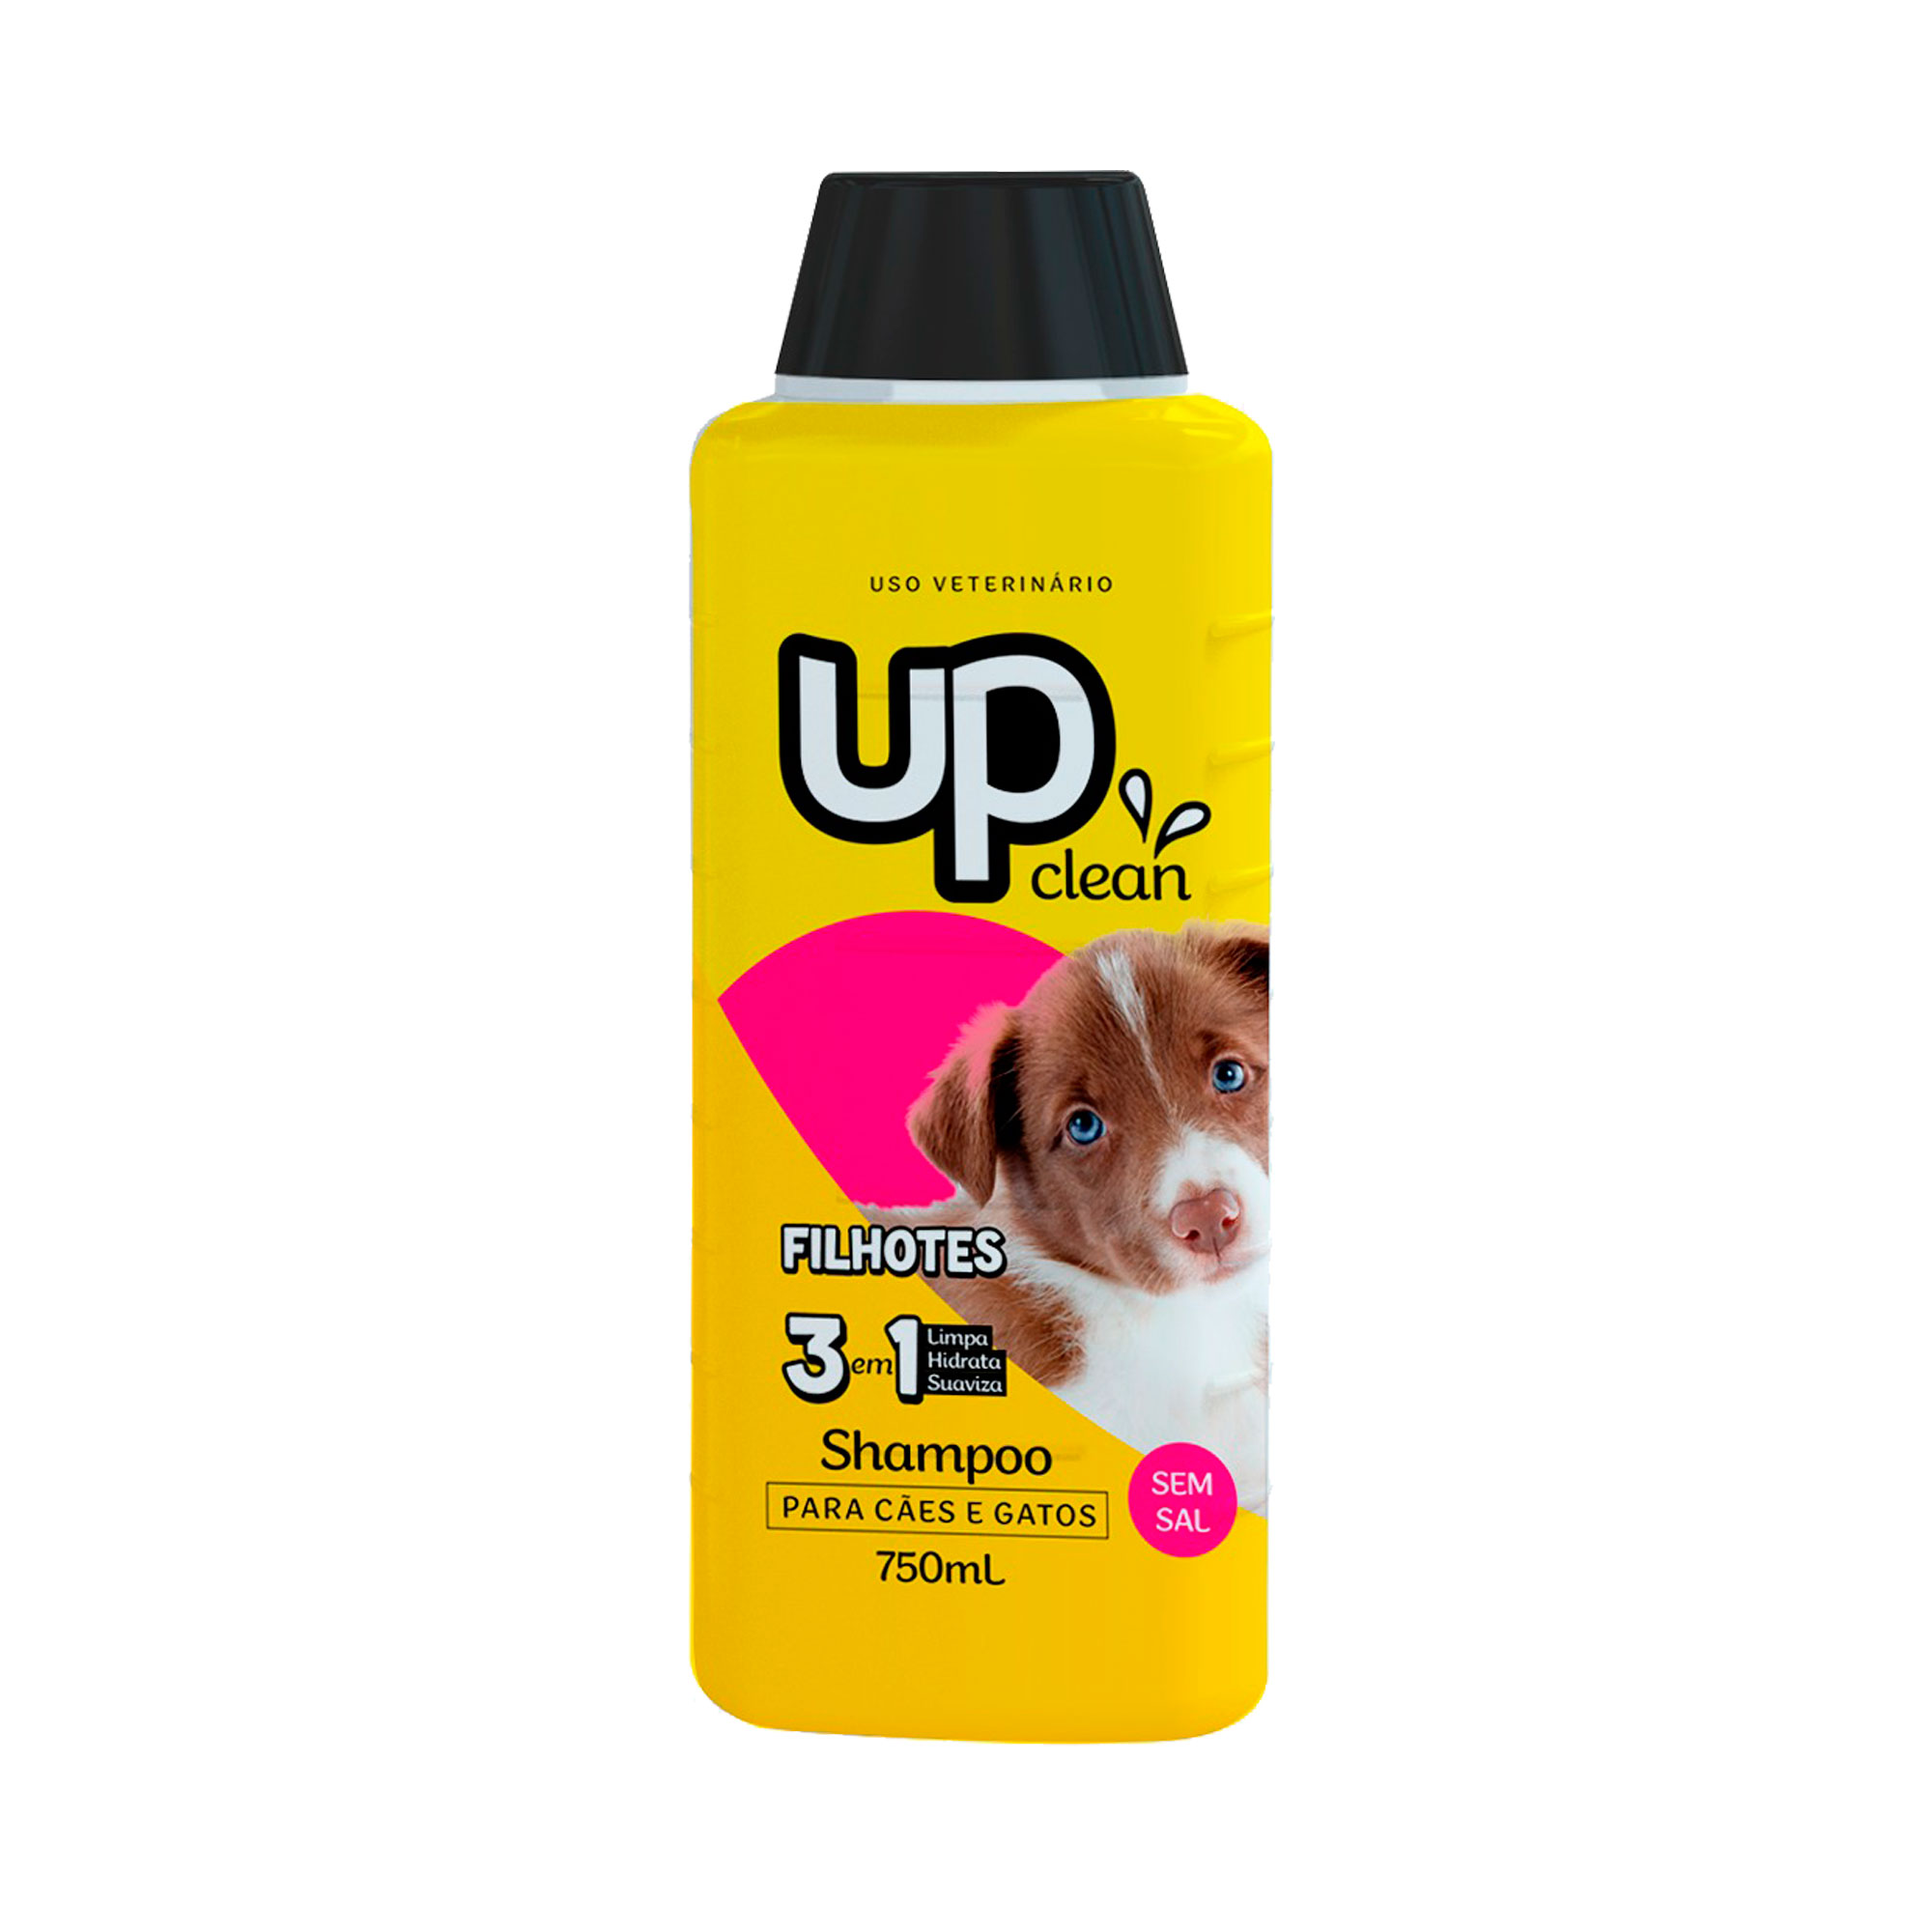 Shampoo Filhotes 750ml Up Clean